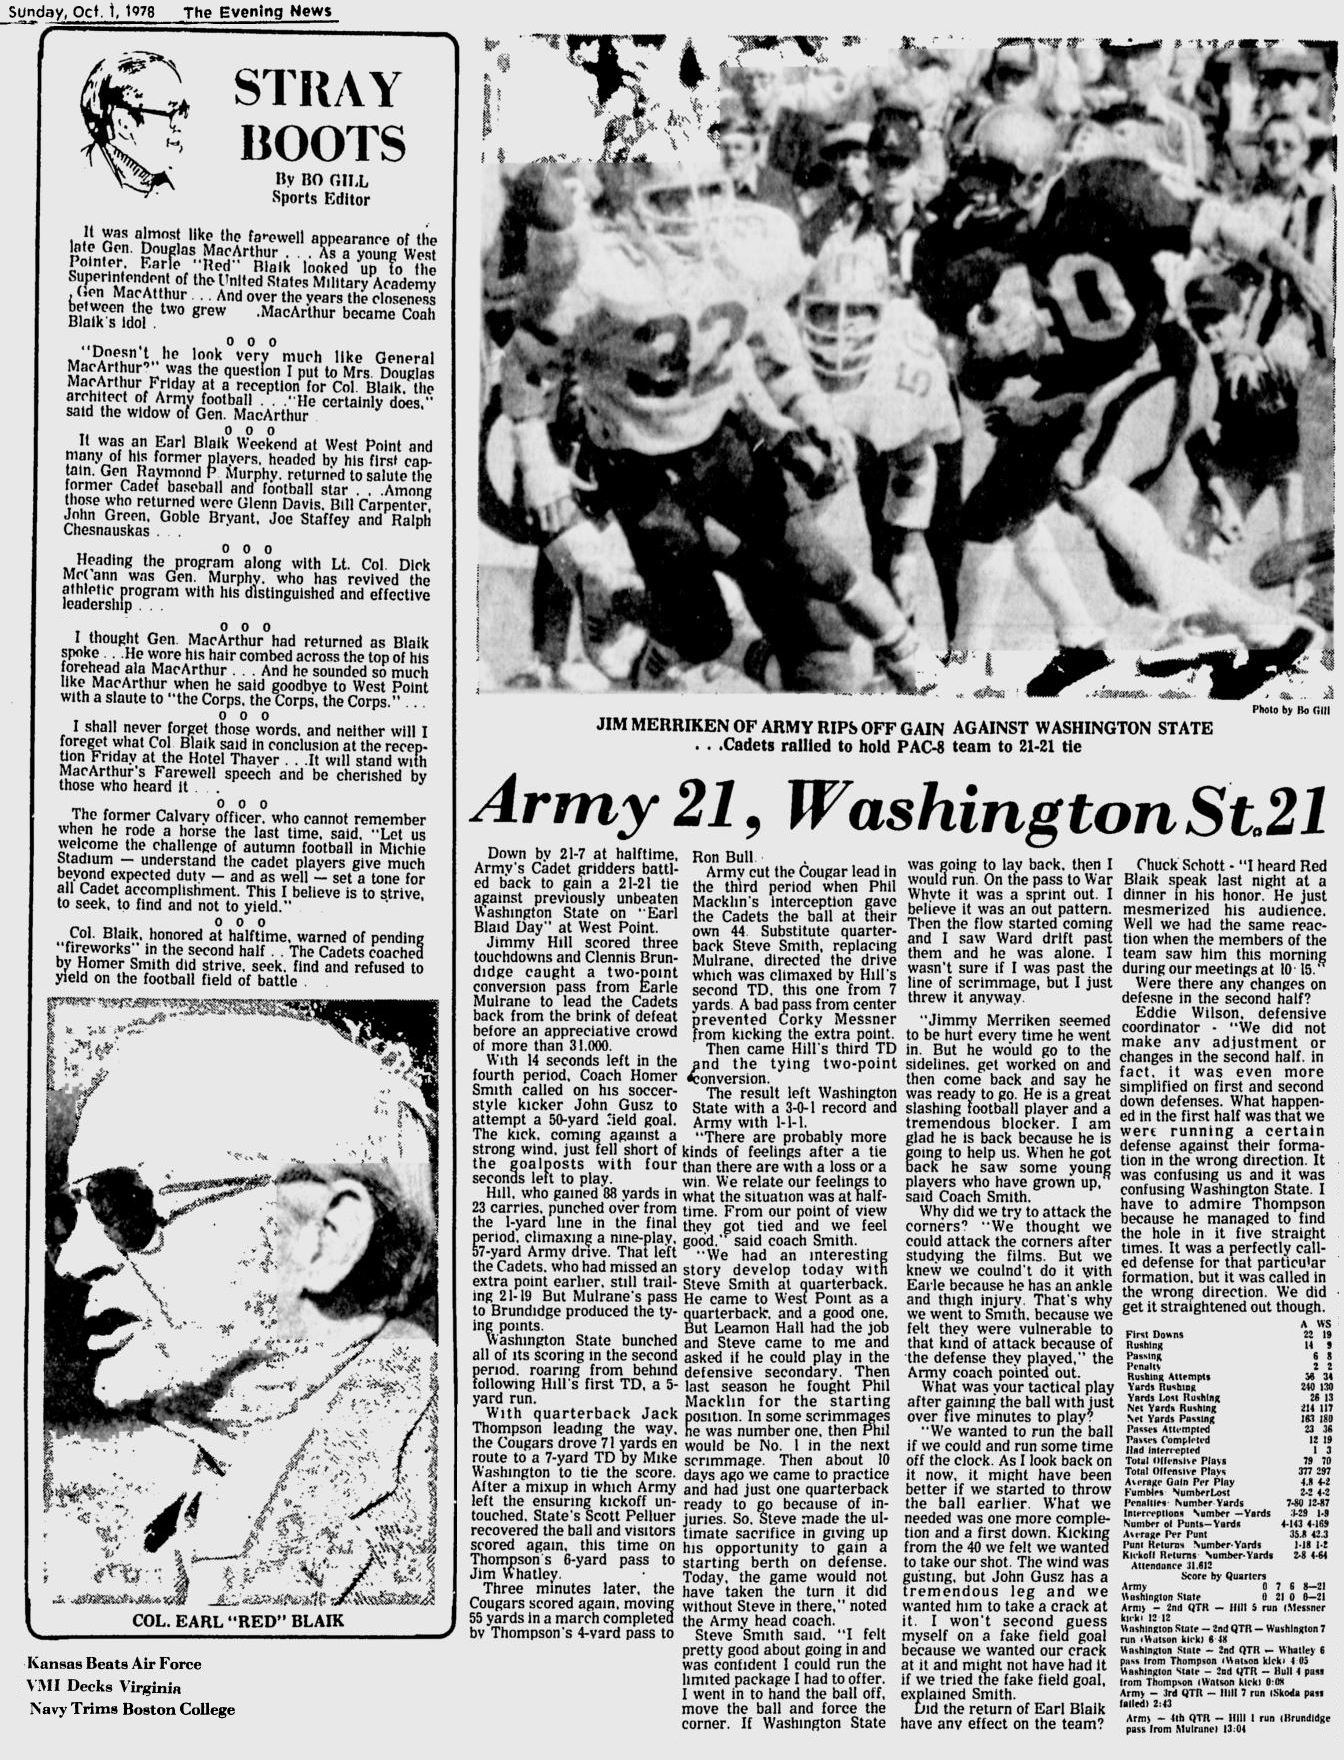 ArmyFB_1978_vsWashingtonState_EveningNews_Oct11978